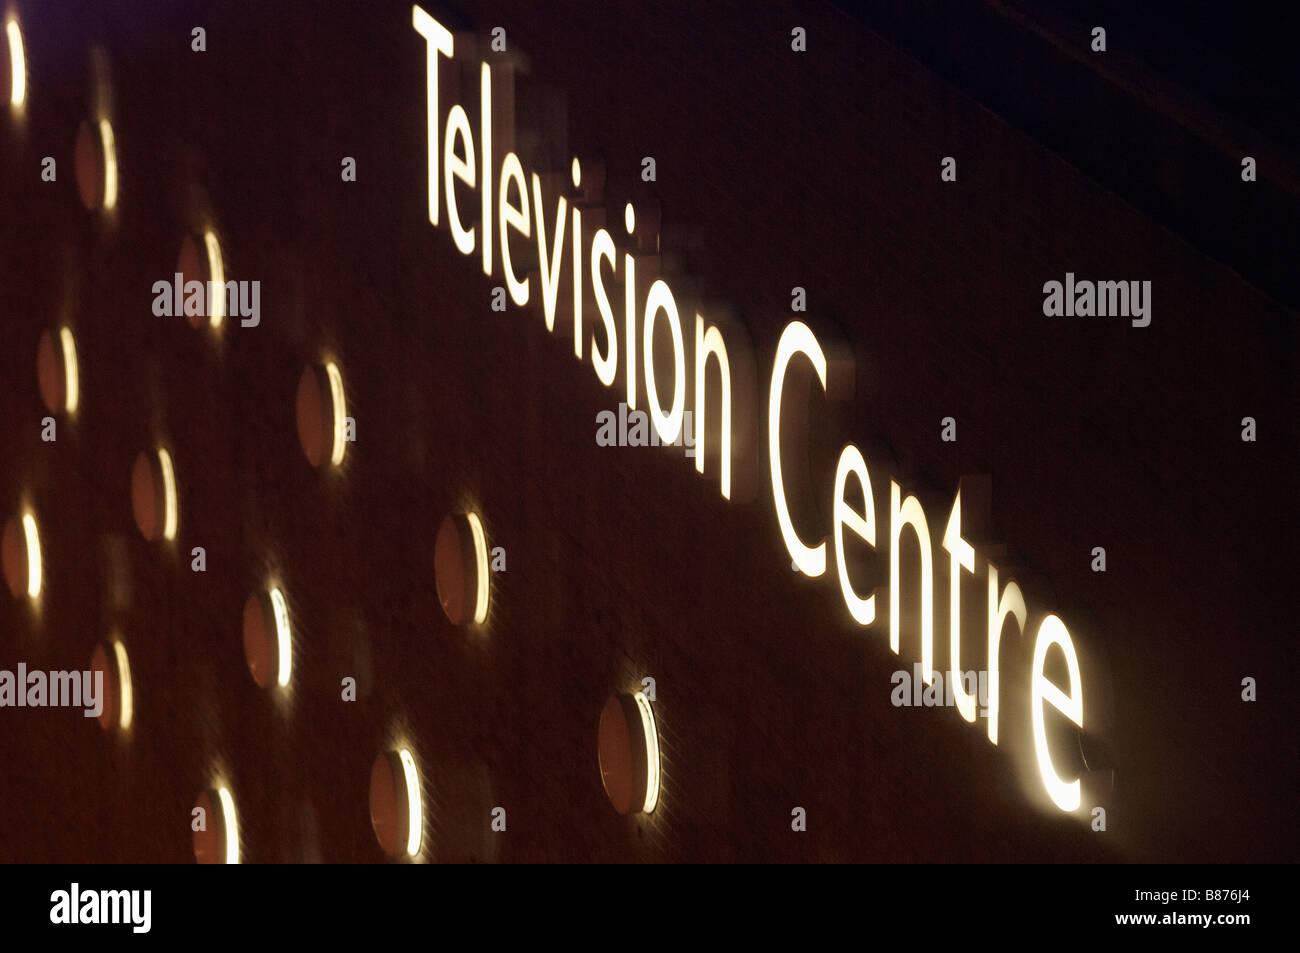 bbc - Stock Image